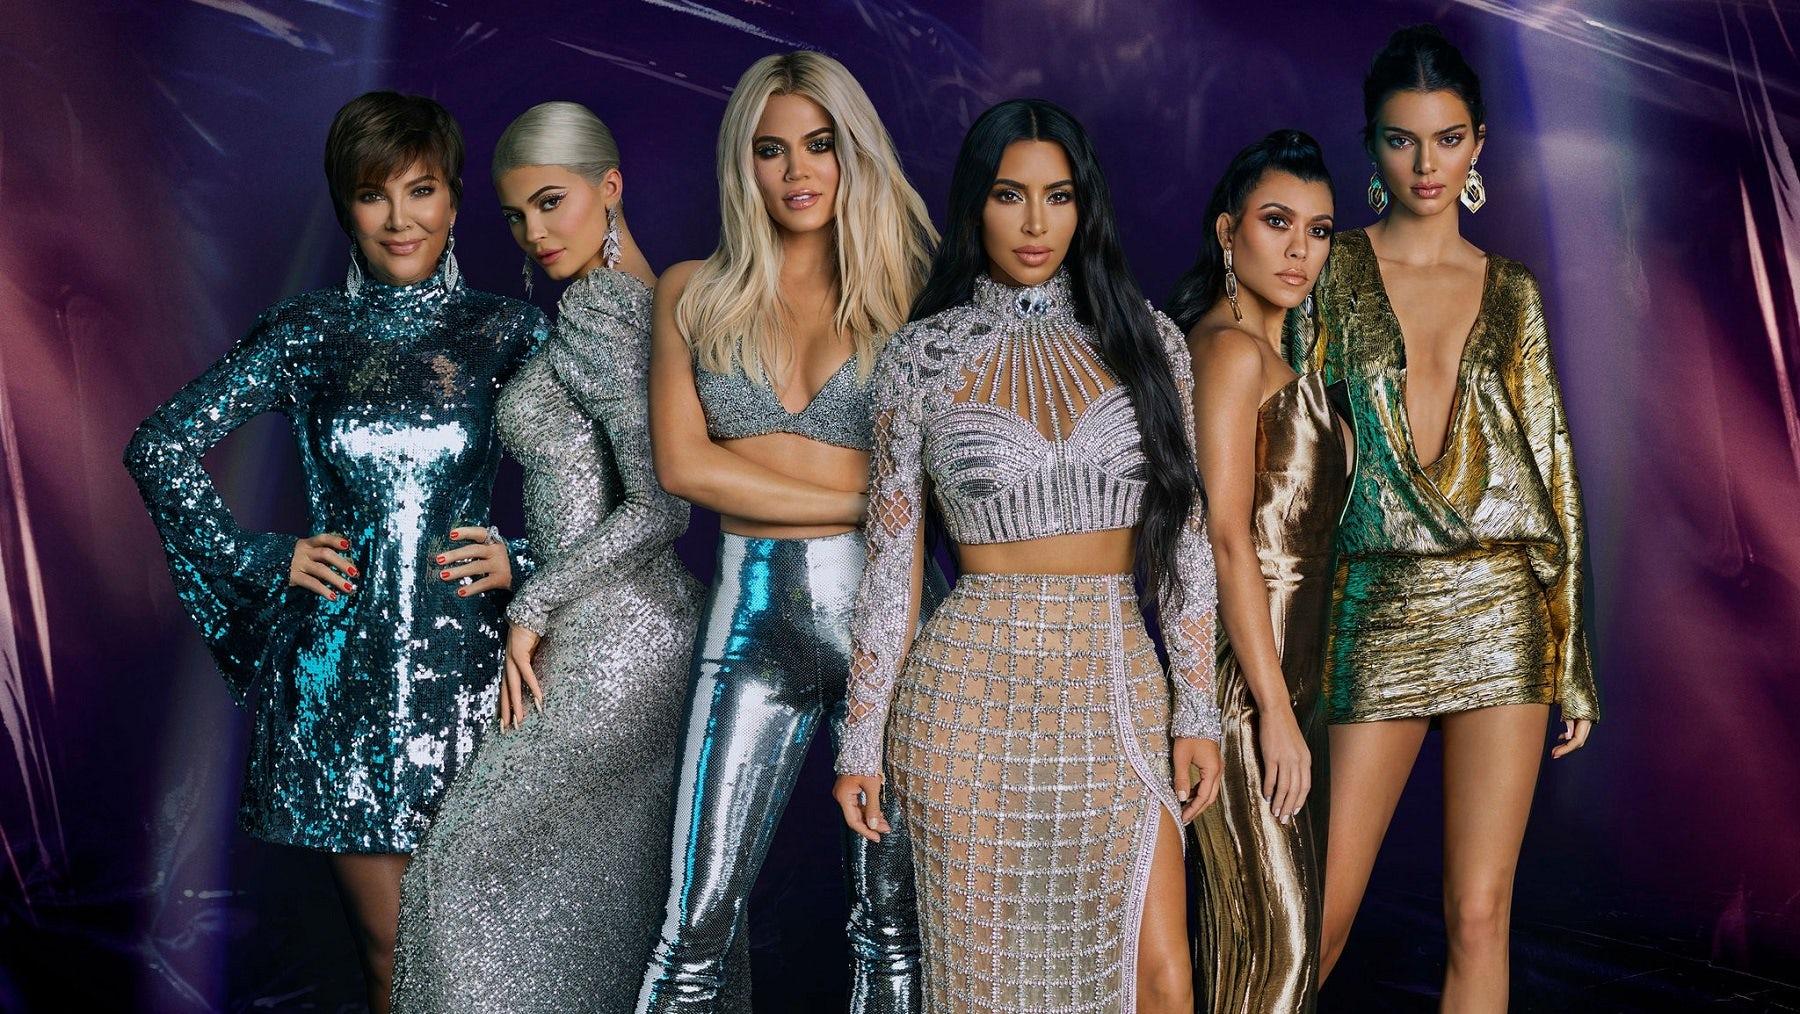 Kardashian dating one direction